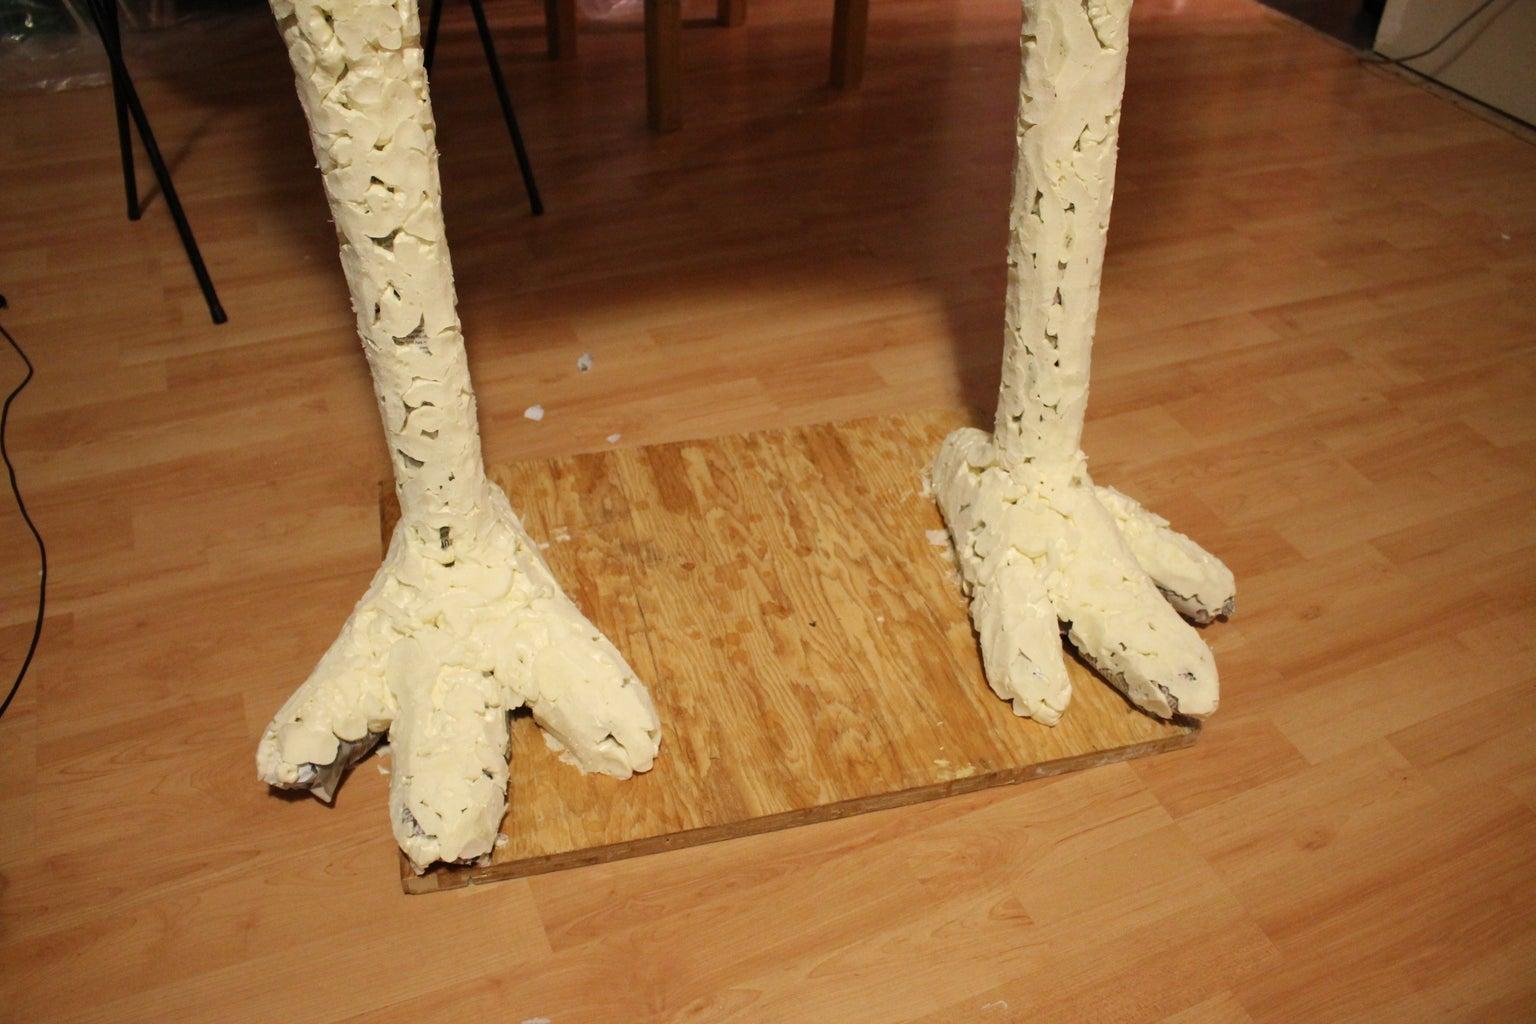 Spray Foam Shaping the Legs